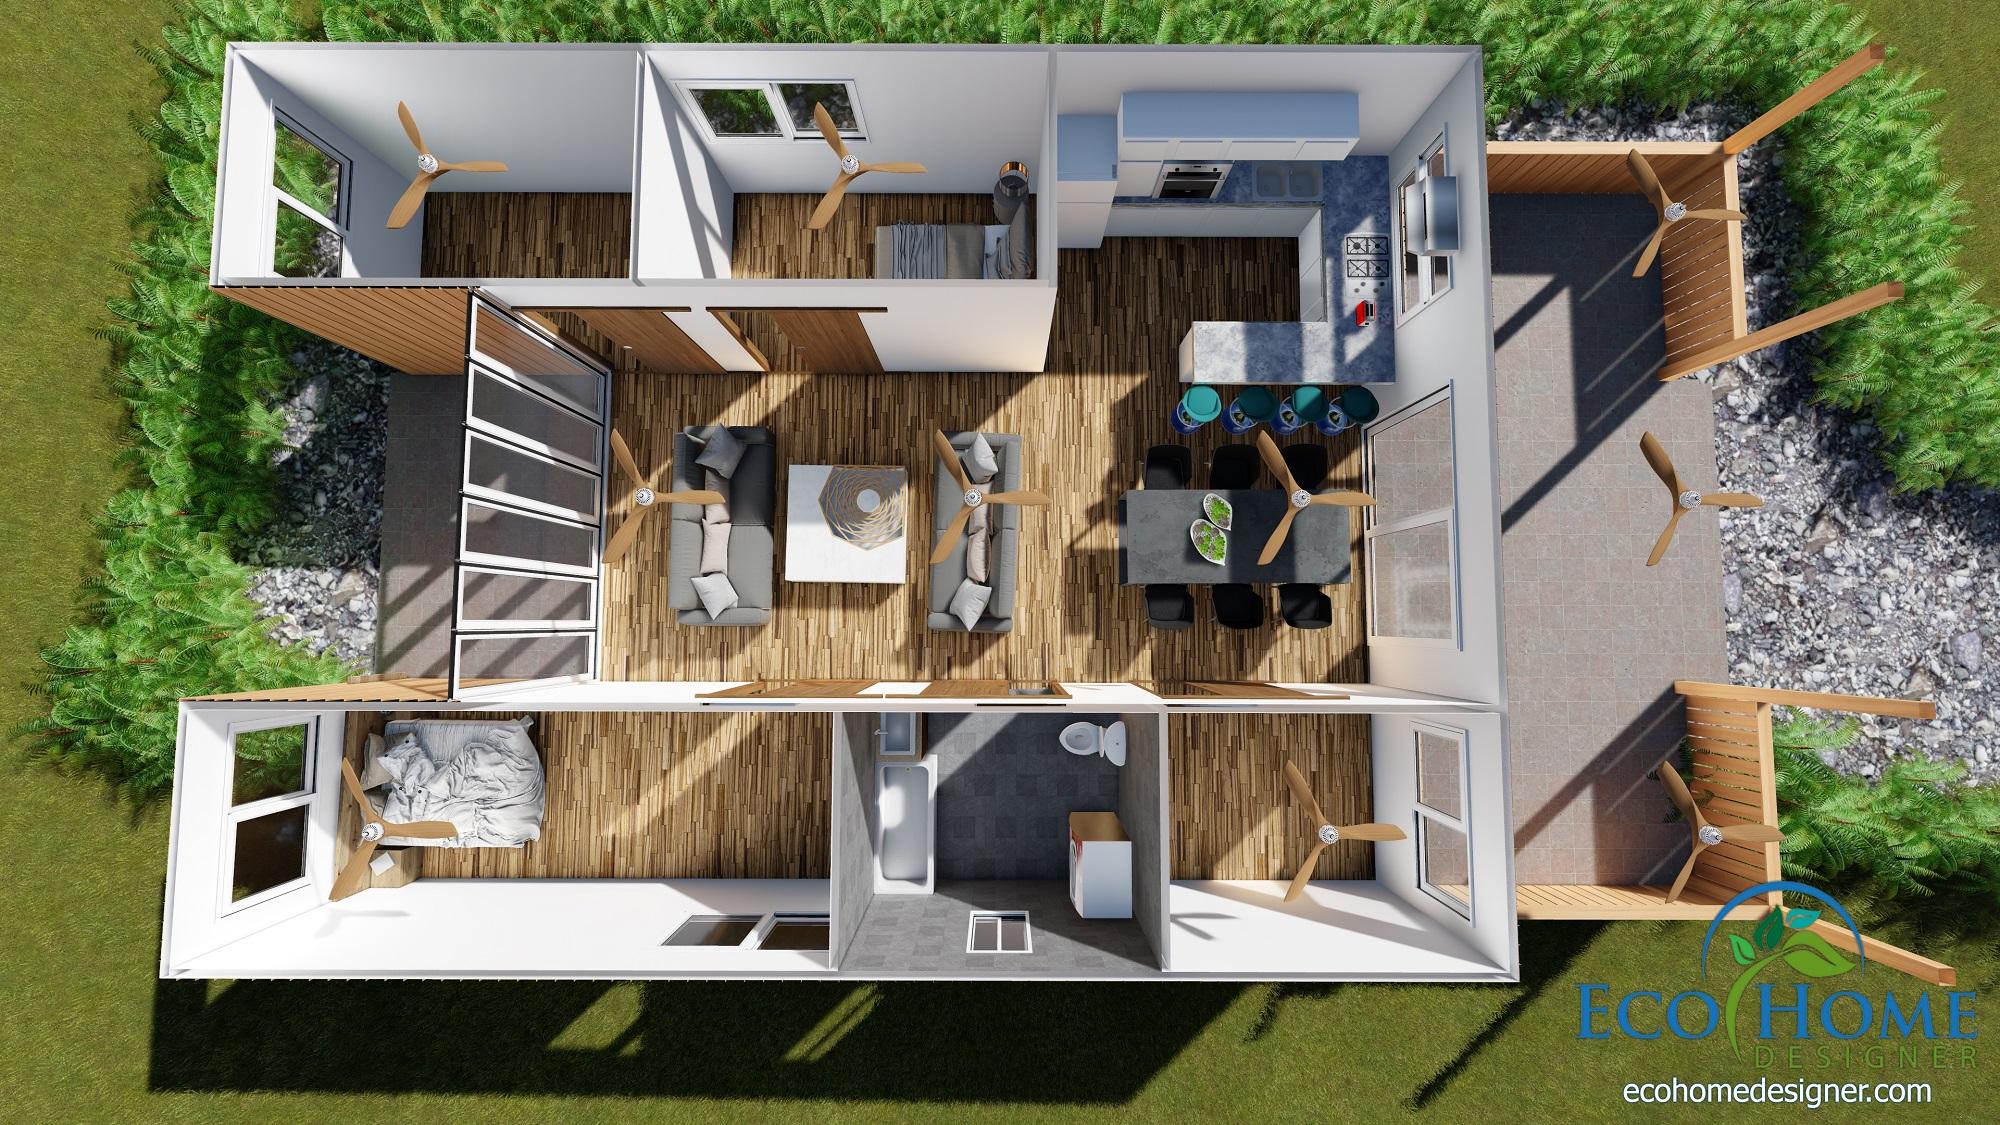 Best Kitchen Gallery: Sch18 2 X 40ft Container Home Plans Eco Home Designer of Container Home Plans  on rachelxblog.com